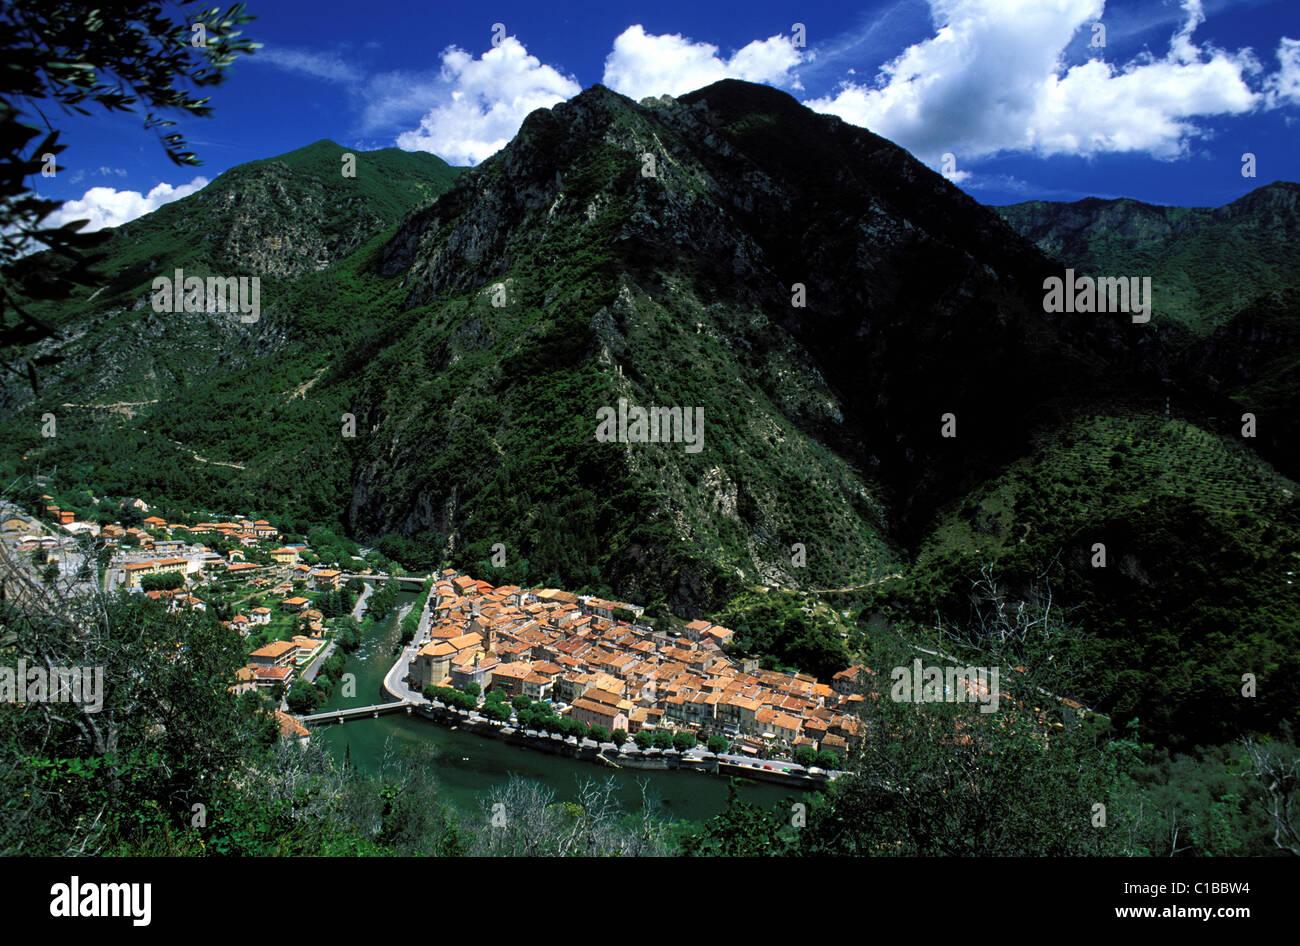 France, Alpes Maritimes, Valley of the Roya (hinterland of Nice), village of Breil sur Roya - Stock Image